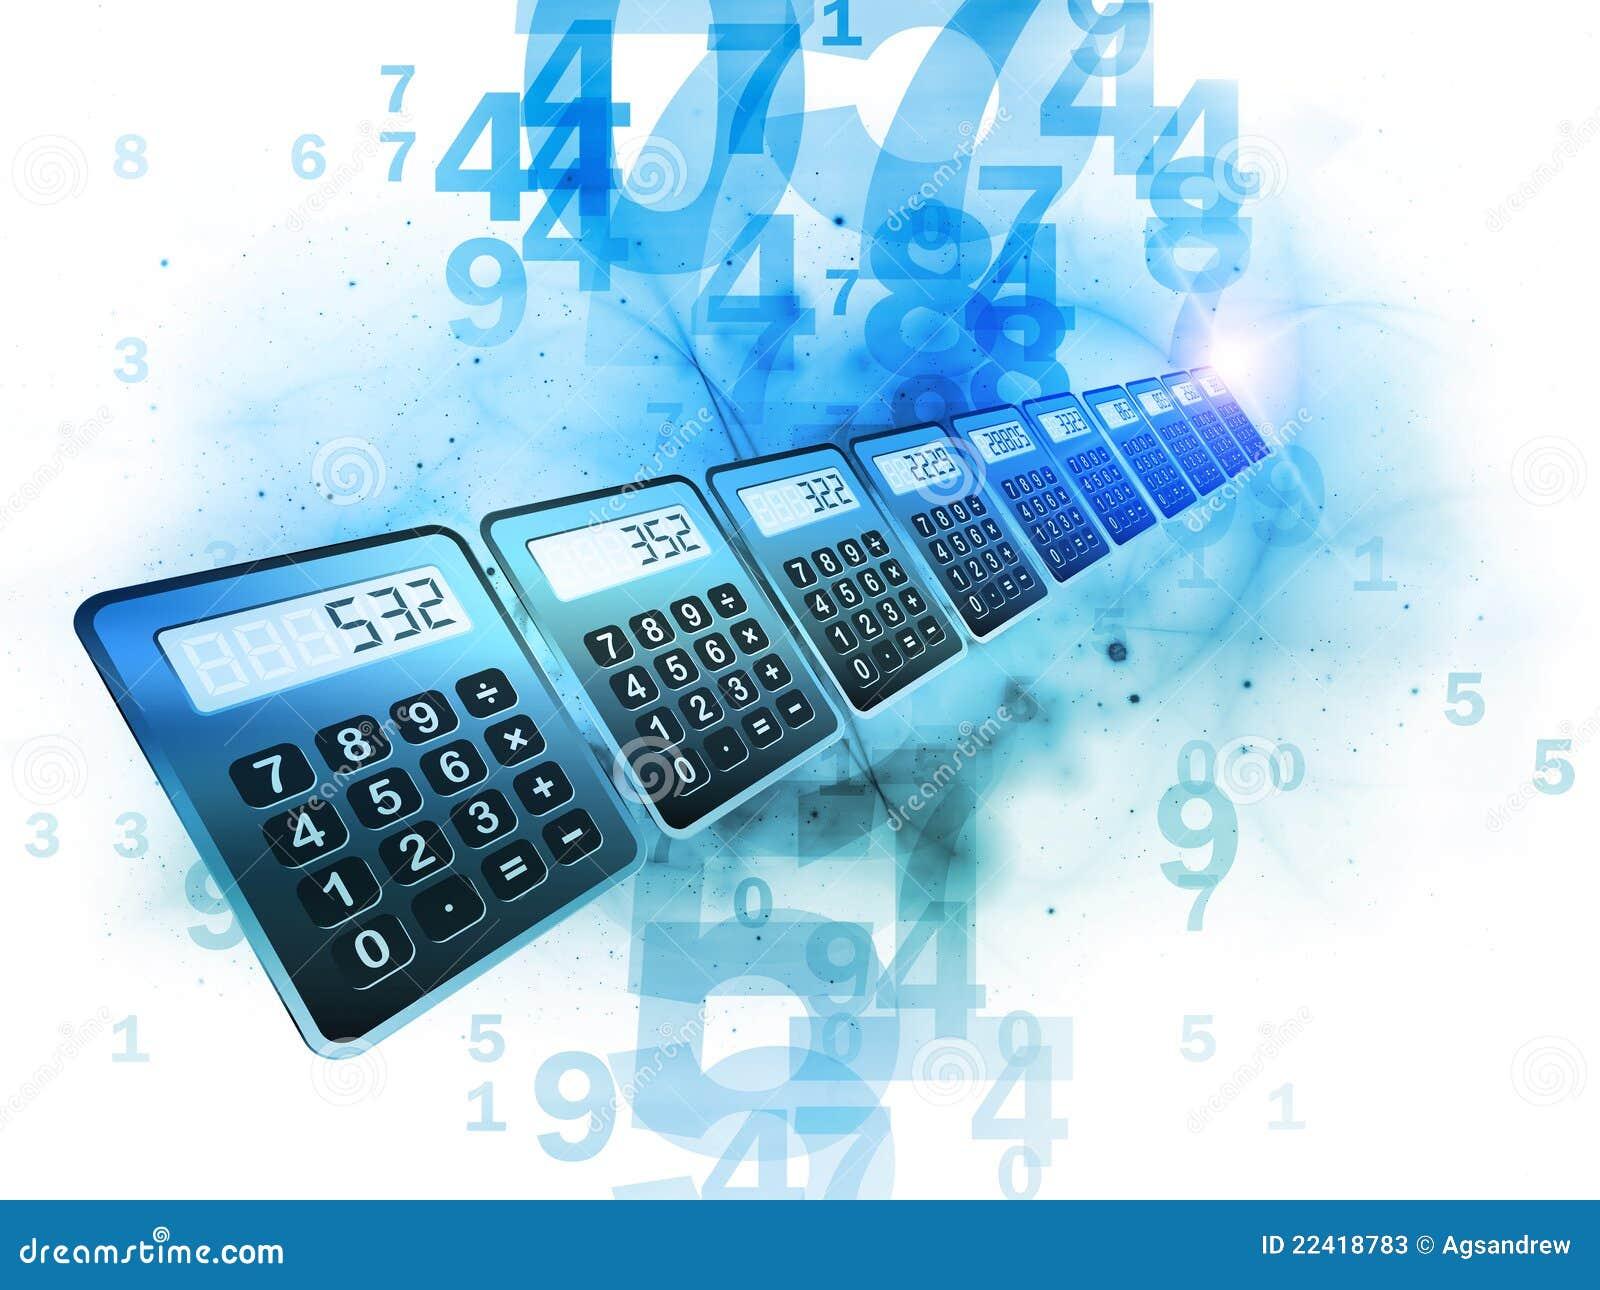 Calculator Perspective Stock Photos Image 22418783